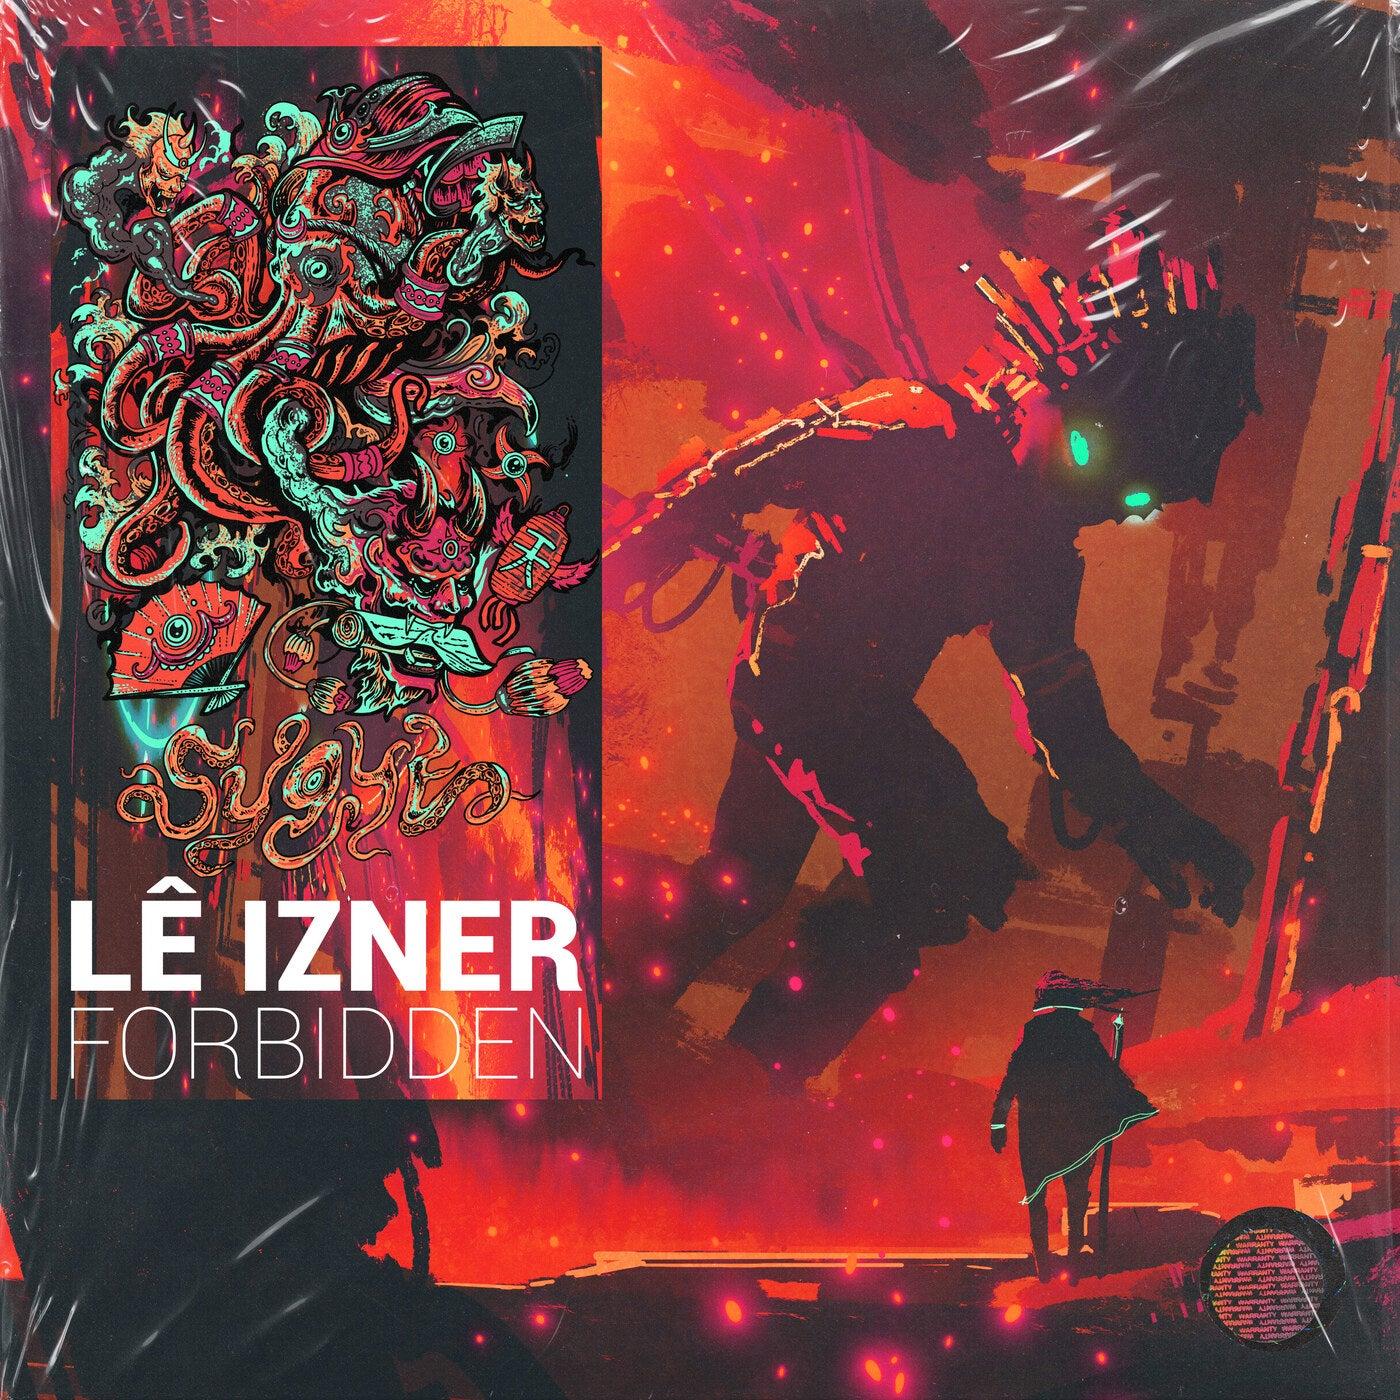 Forbidden (Original Mix)